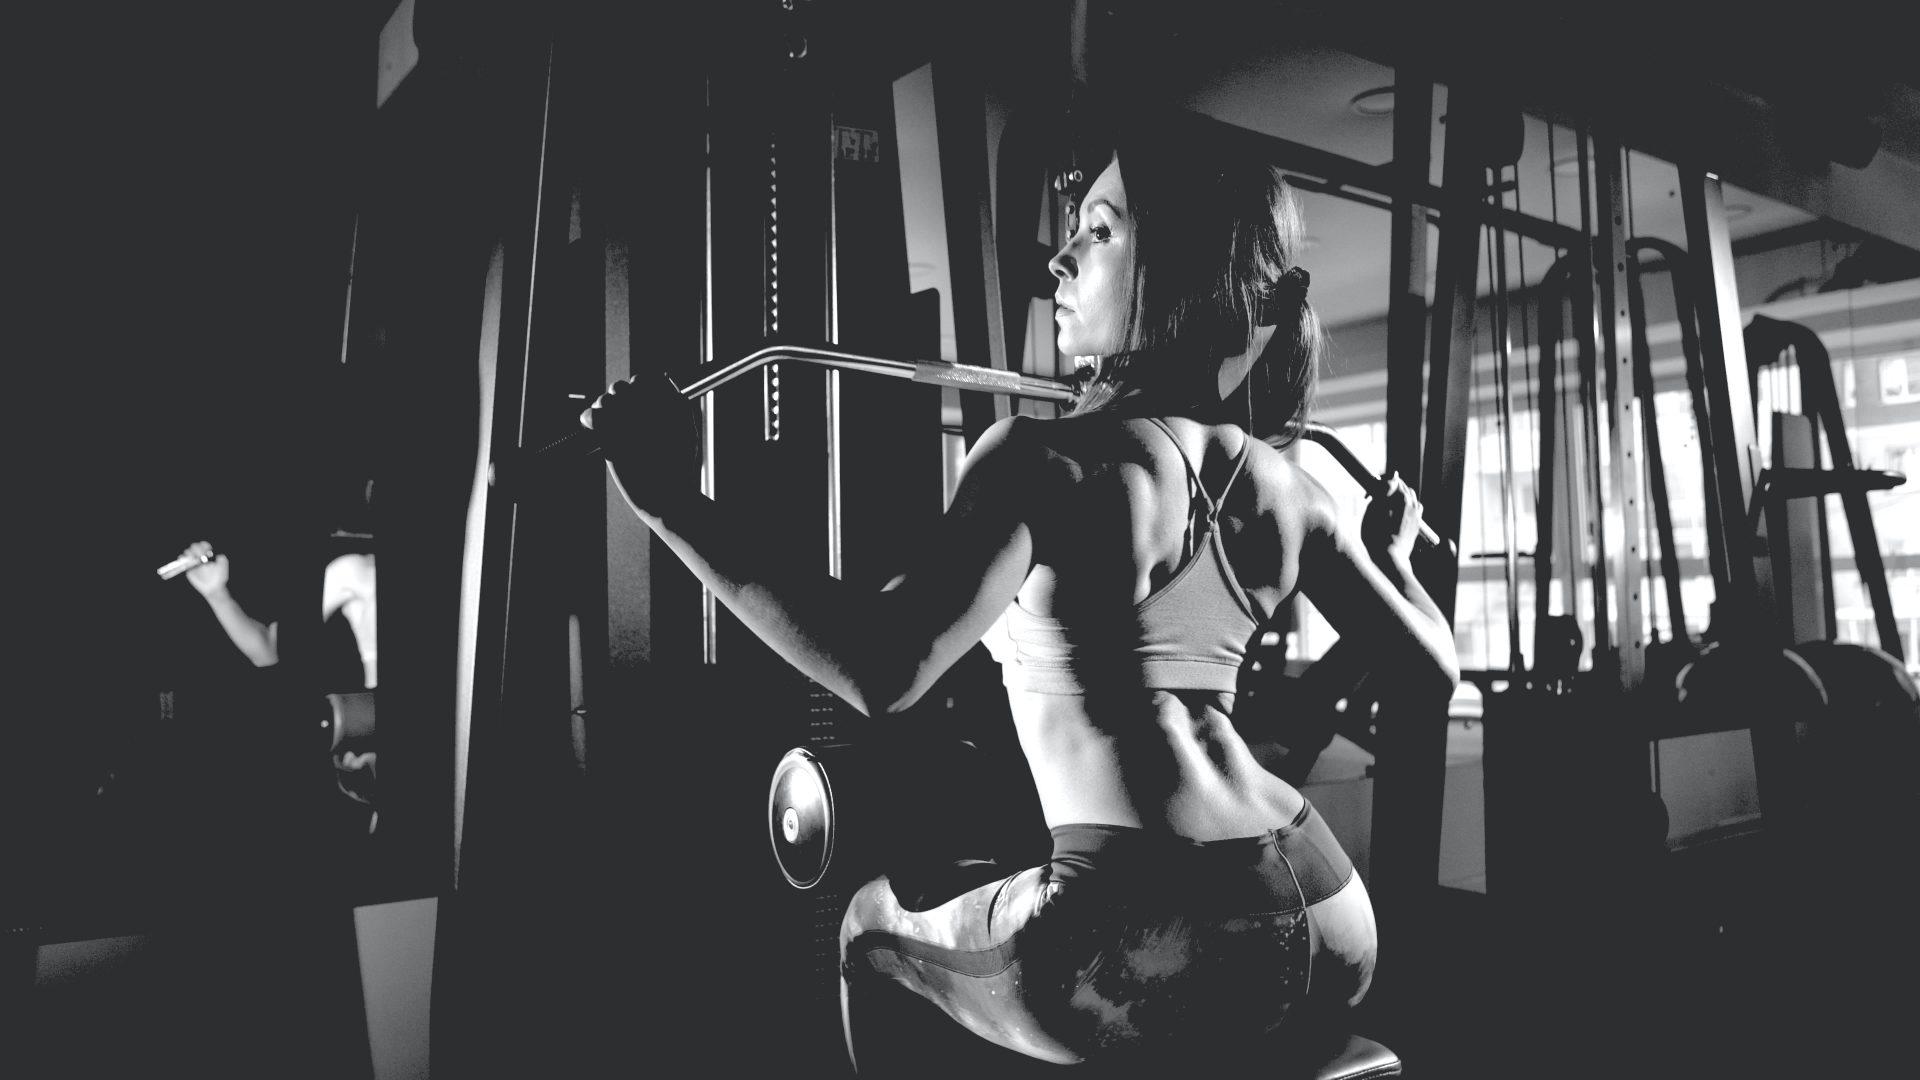 The Back To Basics Workout